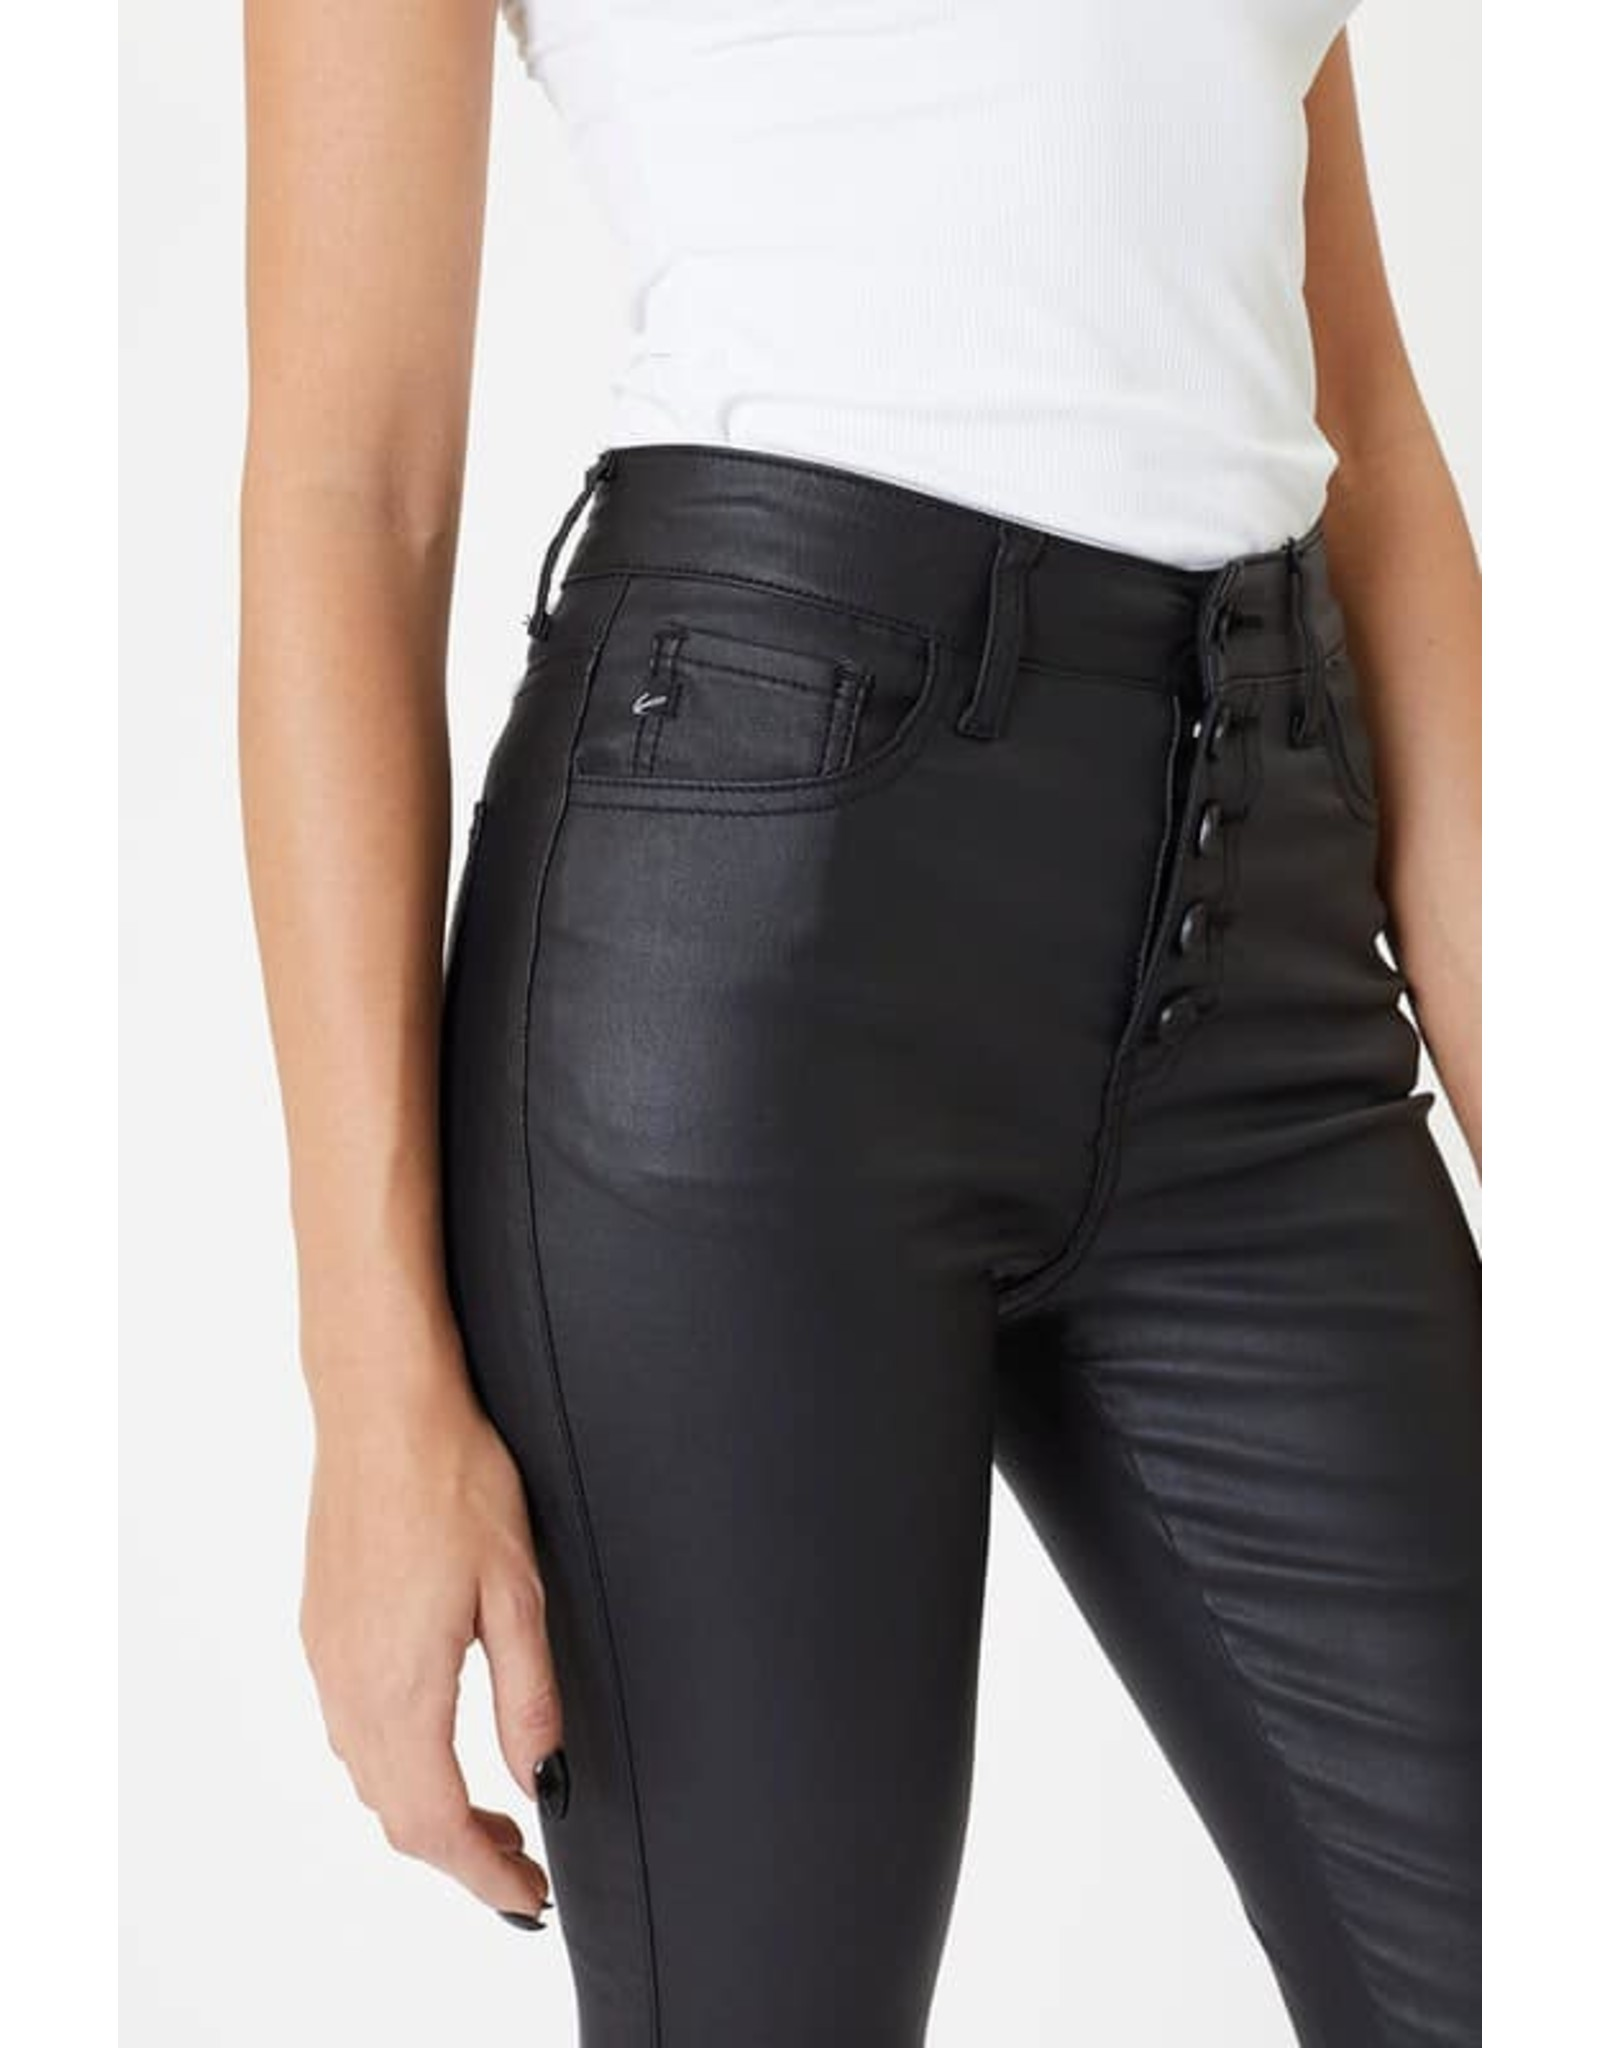 KanCan Faux Leather Jeans